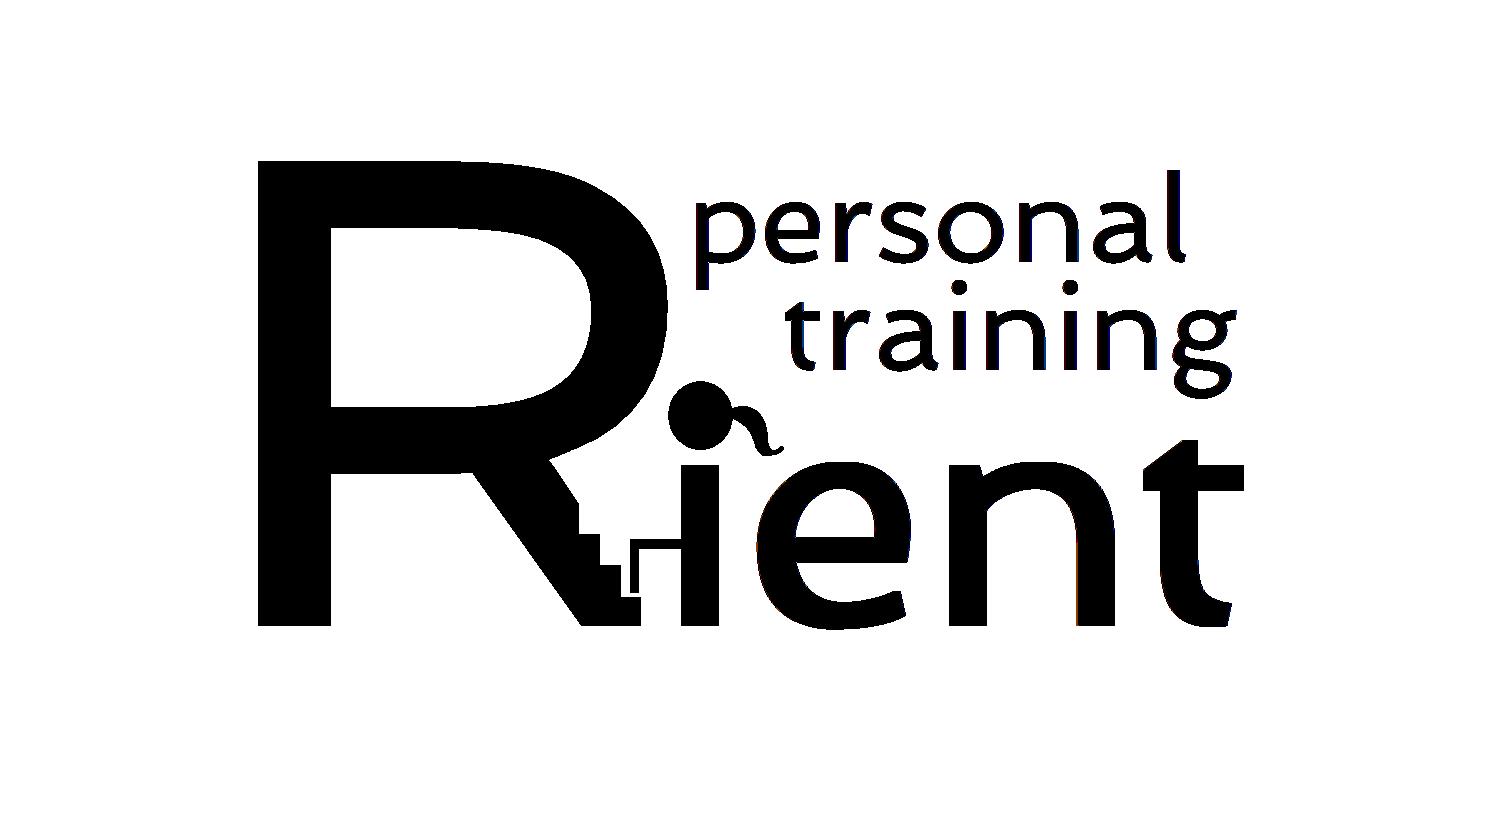 personaltraining Rient